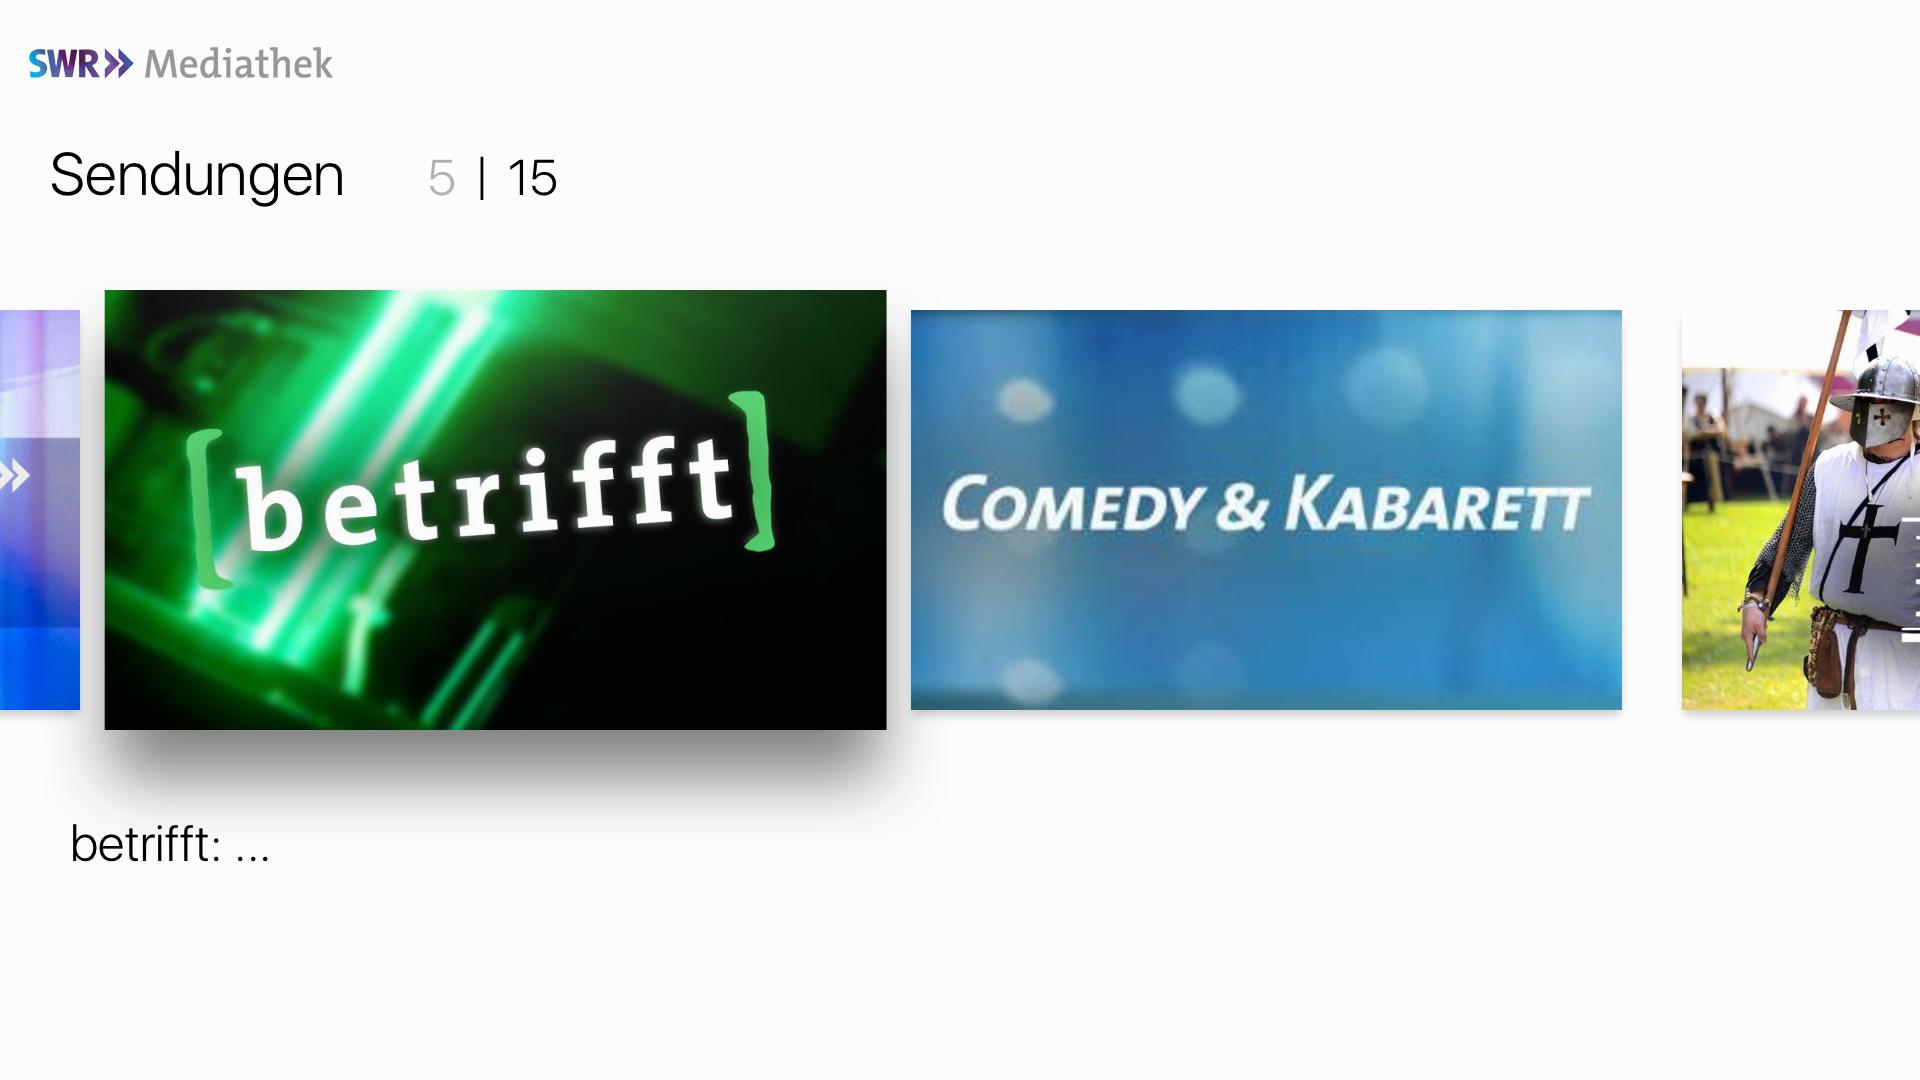 ard mediathek comedy